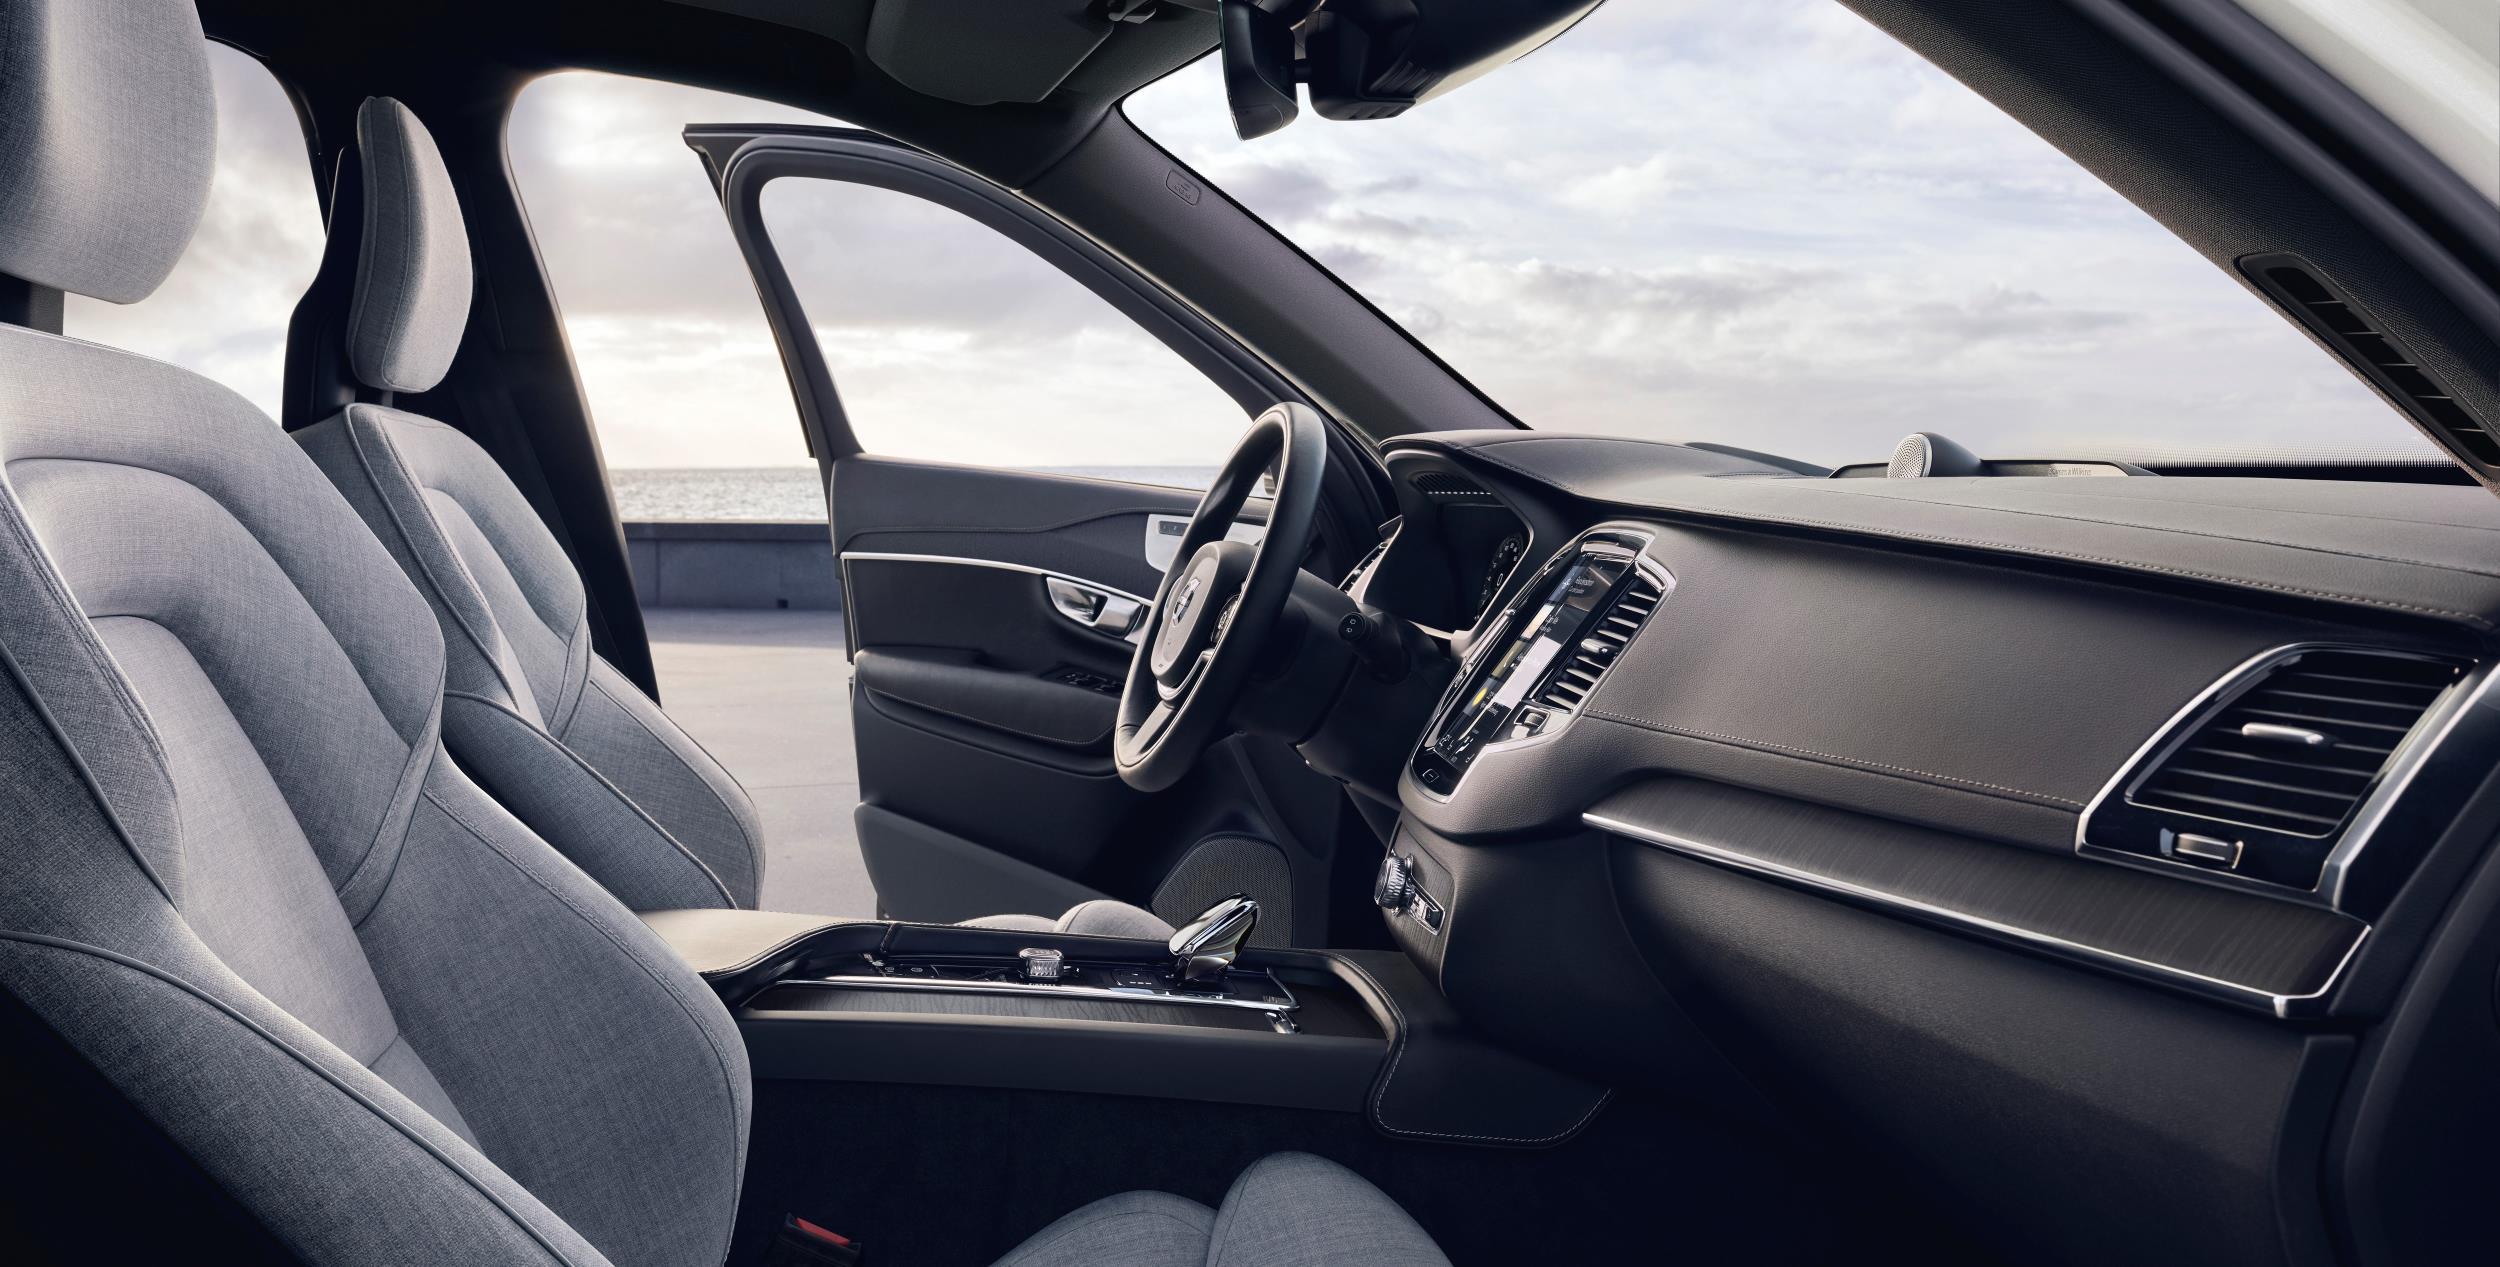 2020 Volvo XC90 Redesign, Hybrid, T8, Interior >> 2020 Volvo Xc90 Announced New B Badge For Mild Hybrid